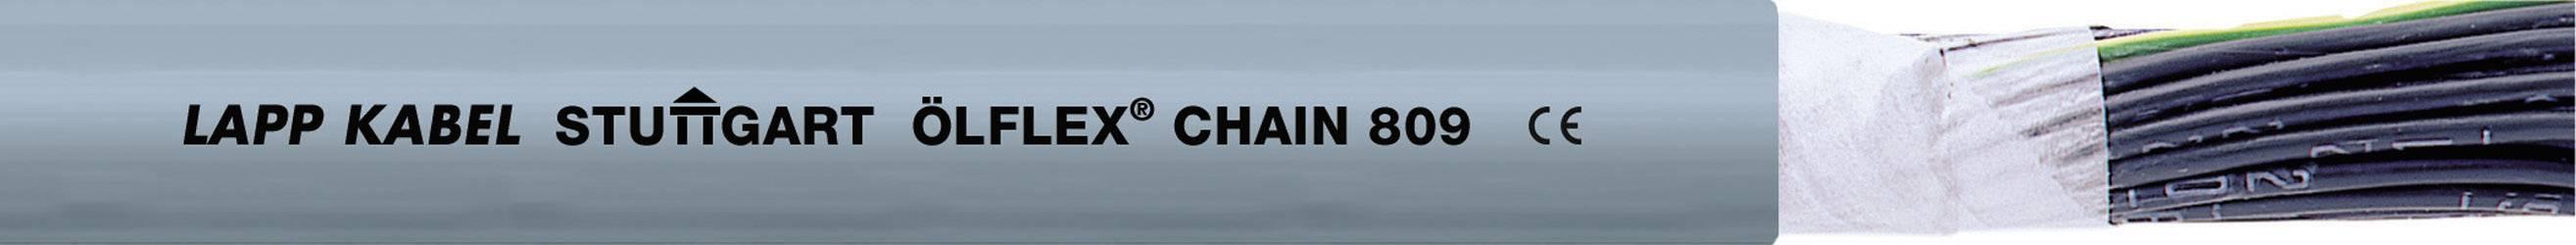 Žíla kabelu LappKabel ÖLFLEX CHAIN 809 2X1,5 (1026724), 2x 1,5 mm², PVC, Ø 6,5 mm, 50 m, šedá